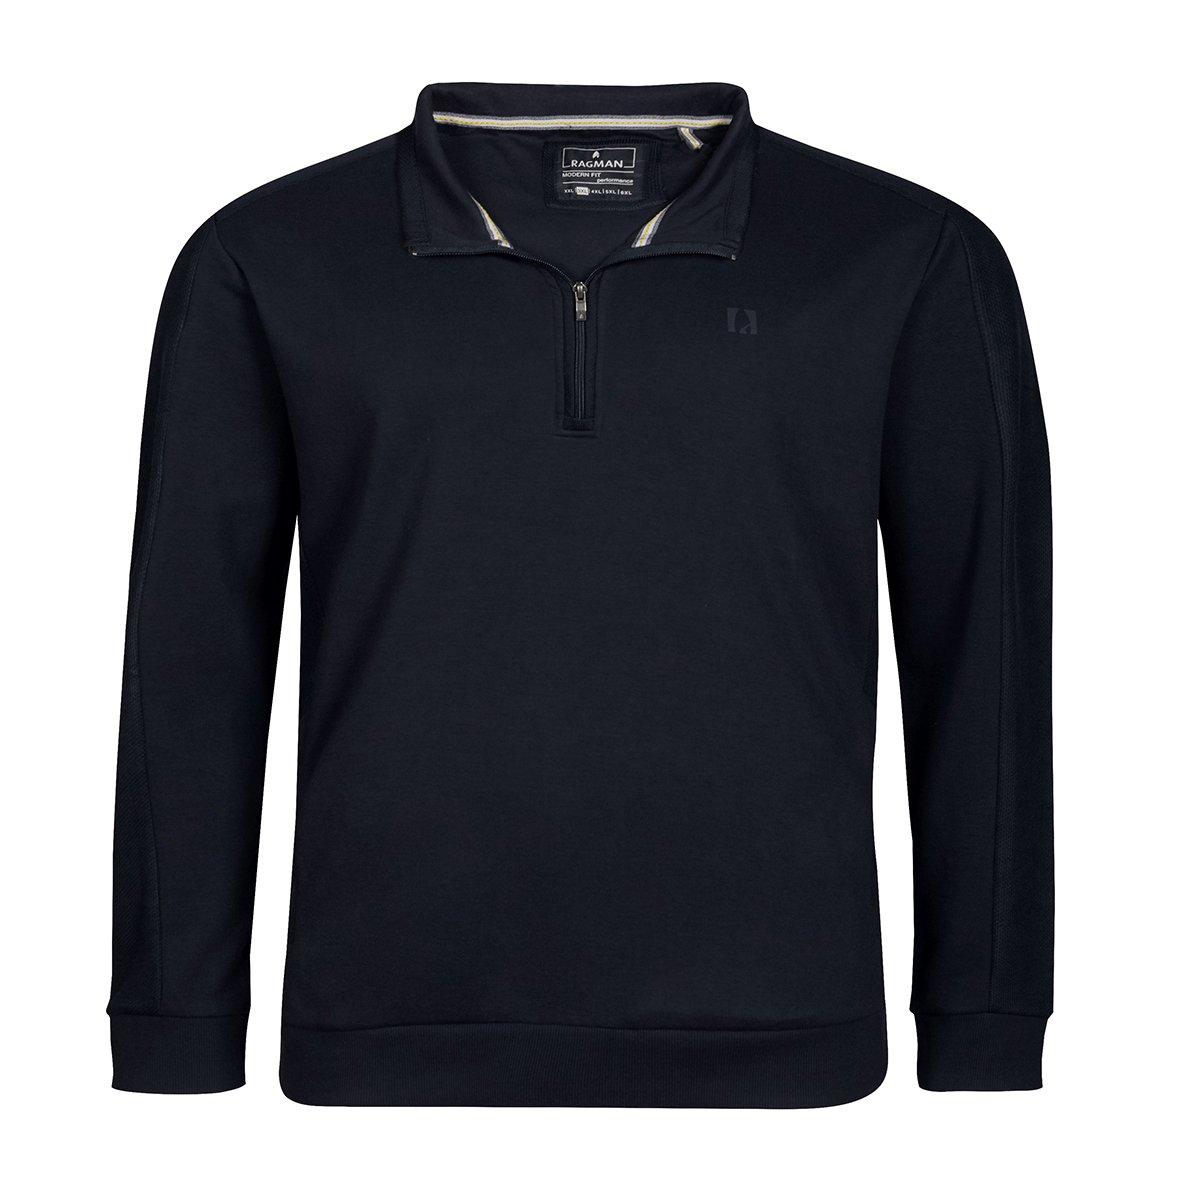 Ragman & 039;Keep dry& 039;Sweattroyer dunkelblau Übergröße